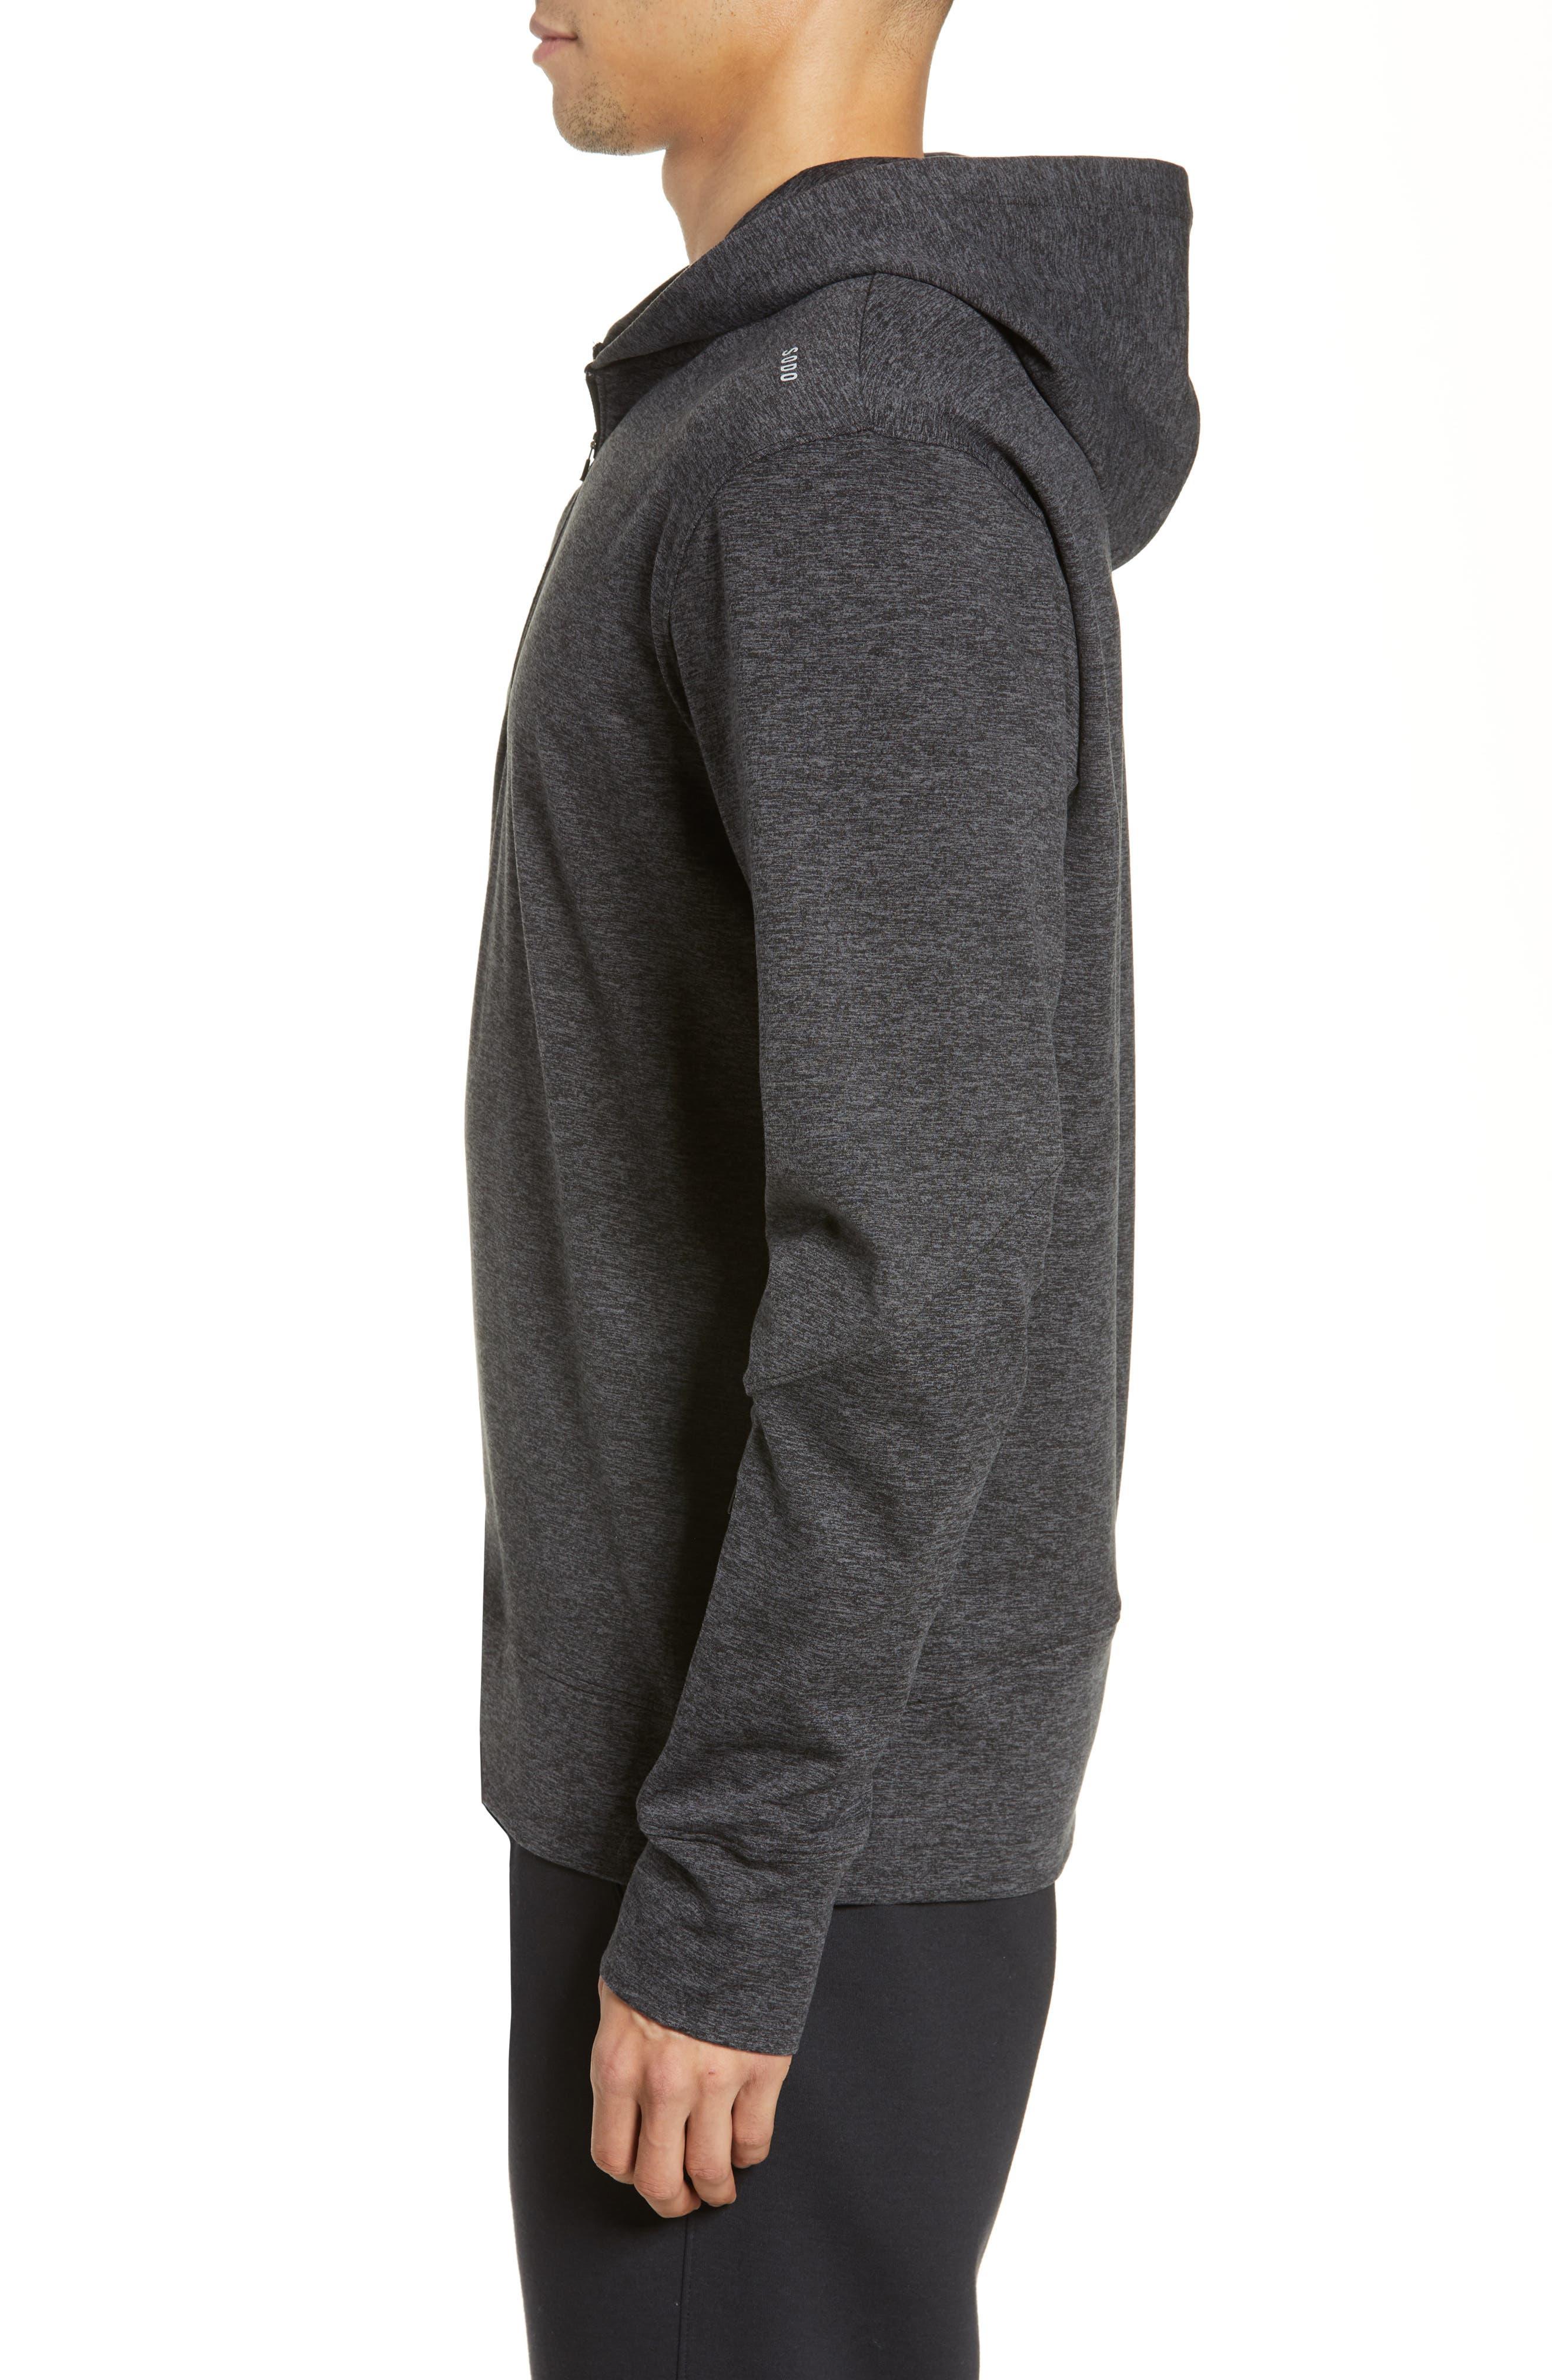 SODO, Elevate Hooded Sweatshirt, Alternate thumbnail 3, color, HEATHER CHARCOAL BLACK/ BLACK